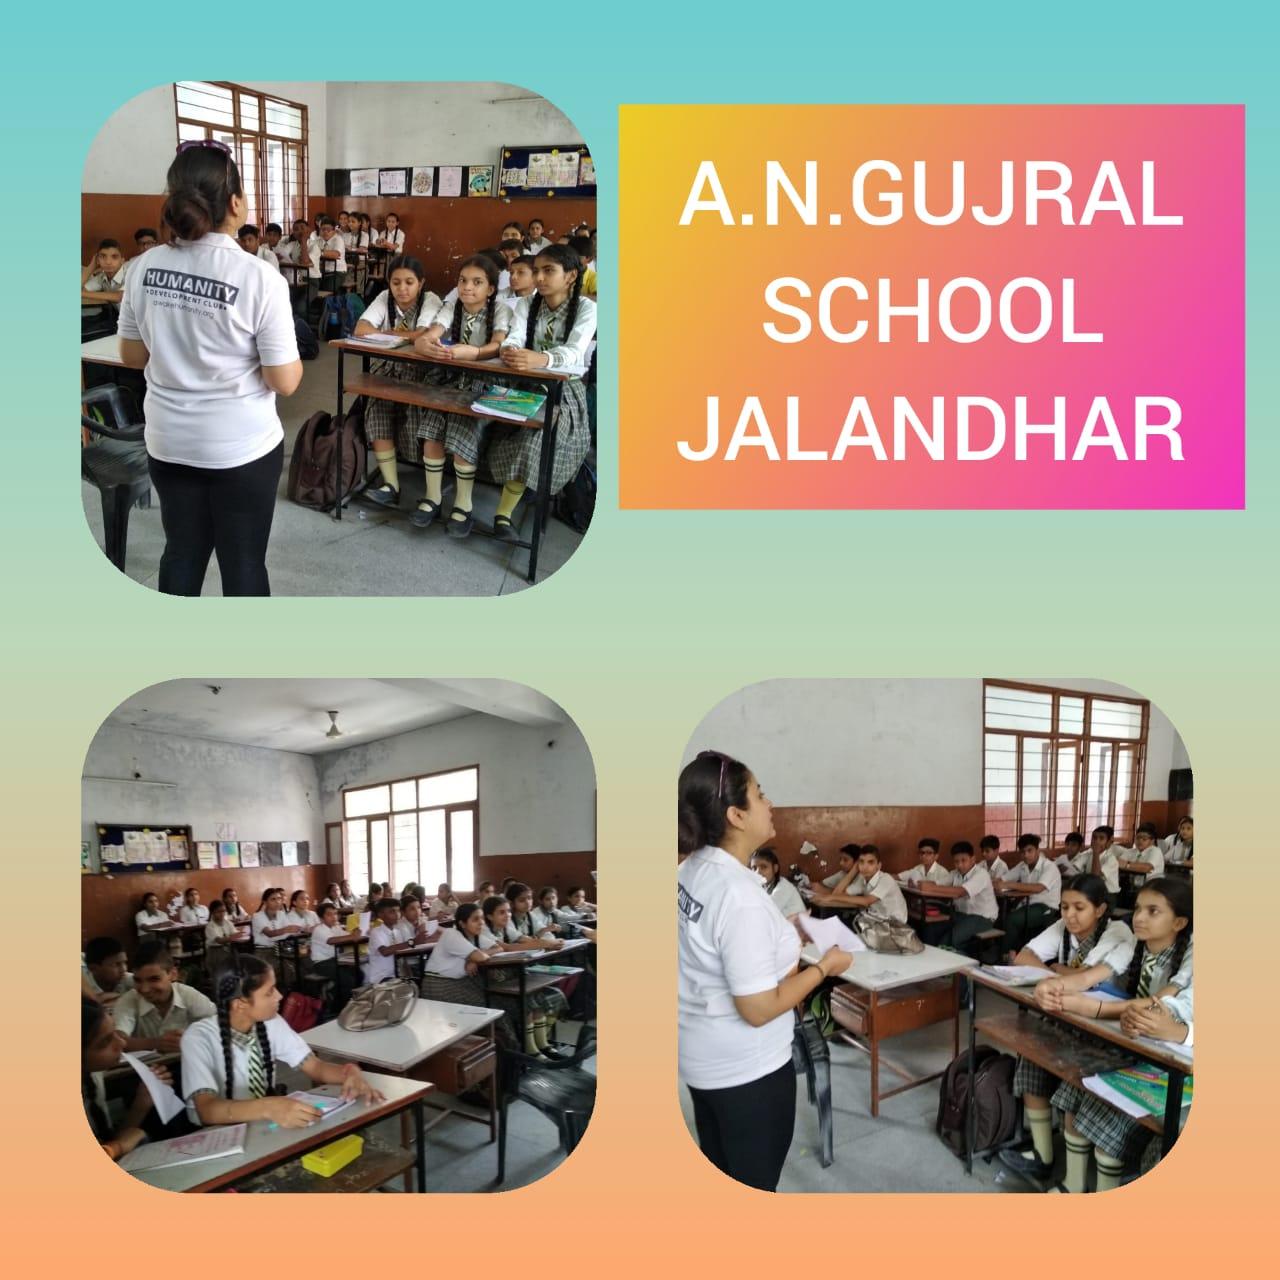 A N Gujral School Jalandhar.jpeg